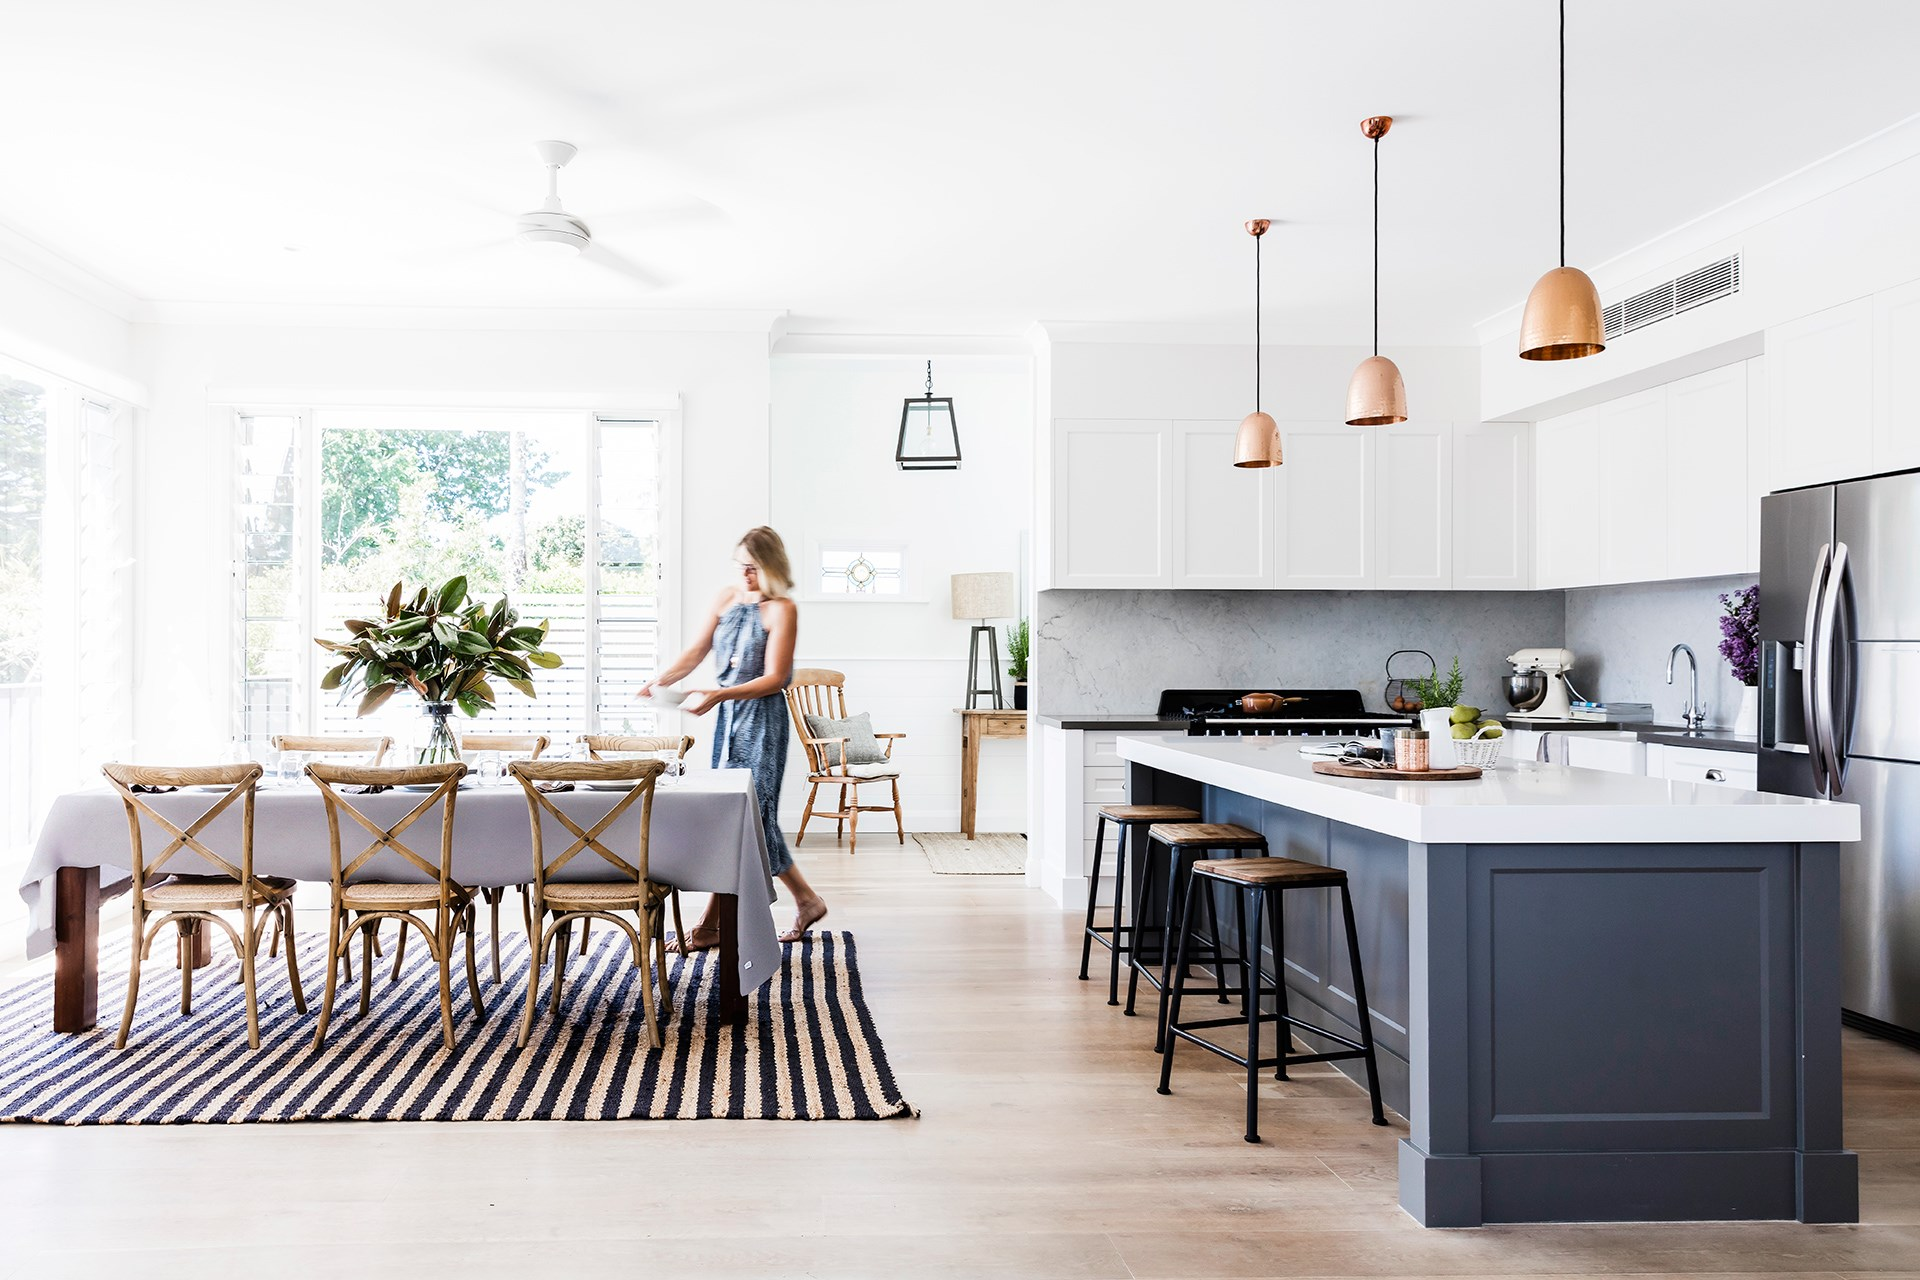 [Serial renovators triumph with New England-inspired home](http://www.homestolove.com.au/serial-renovators-triumph-with-new-england-inspired-home-3034). Photo: Maree Homer / *Australian House & Garden*